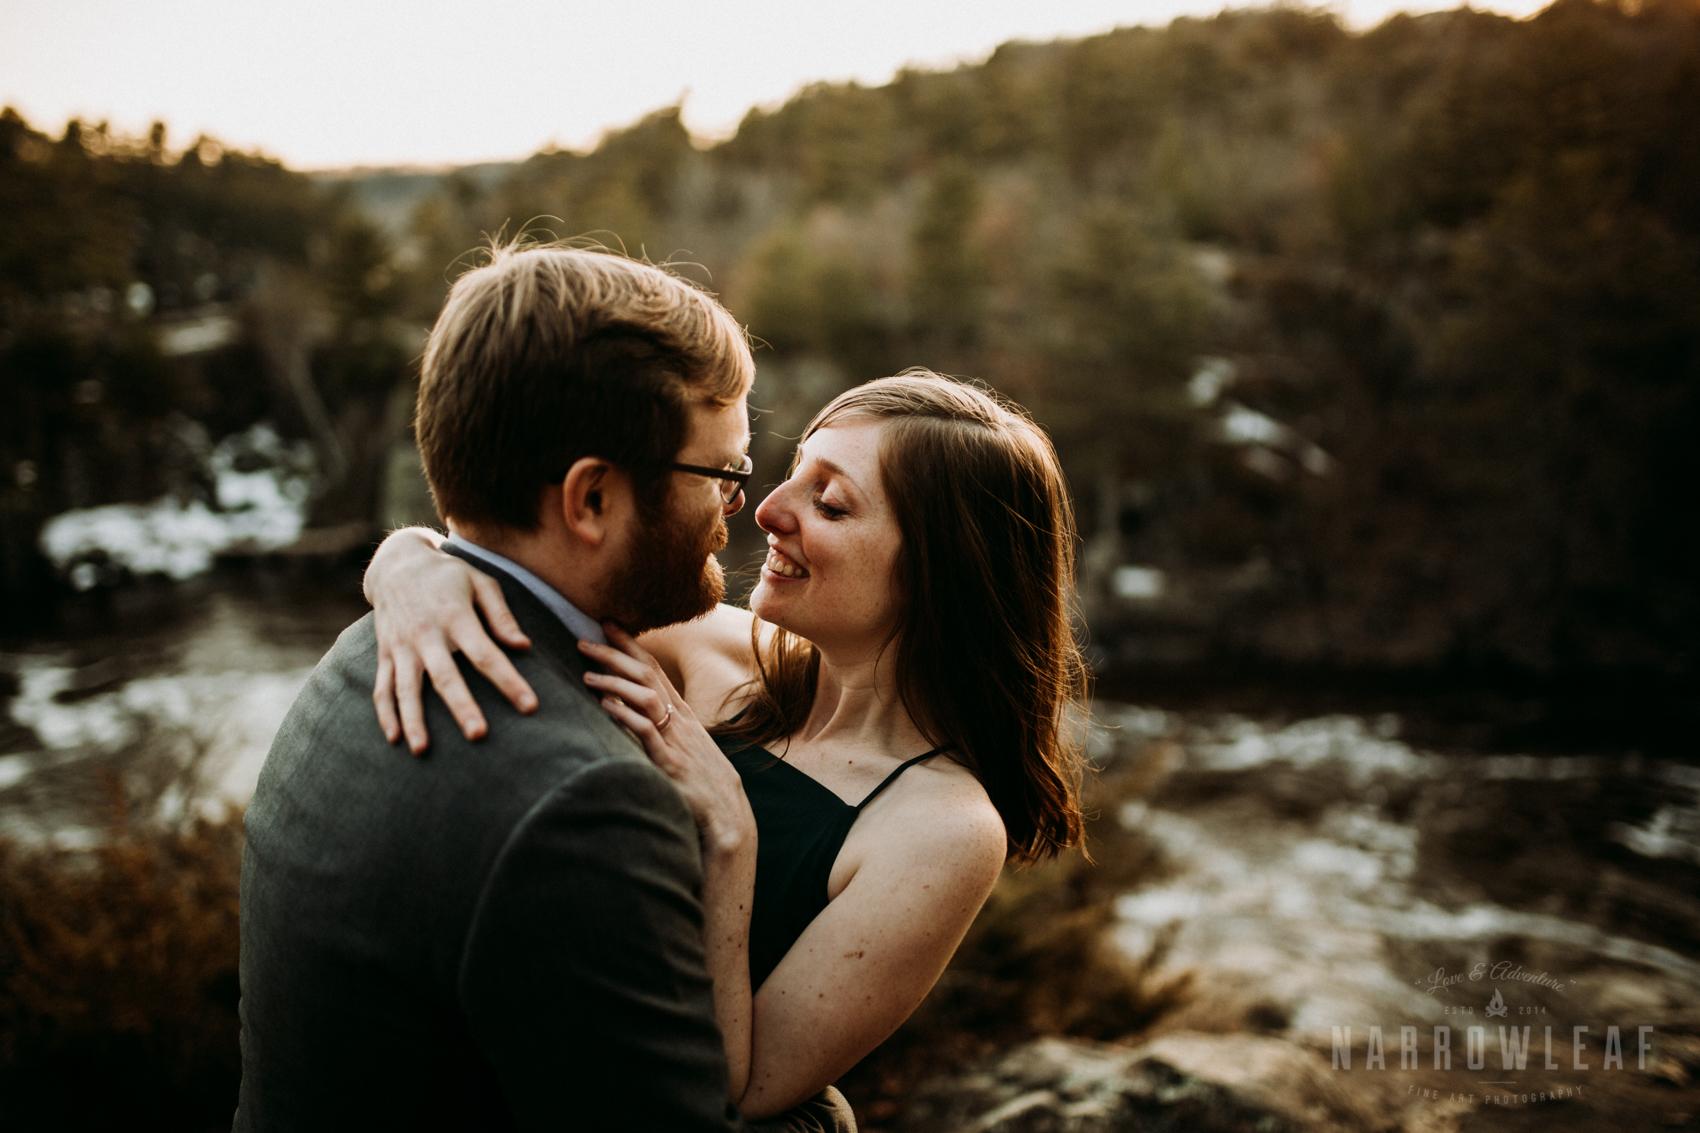 Spring-moody-wisconsin-woodsy-elopement-NarrowLeaf_Love_&_Adventure_Photography-9278.jpg